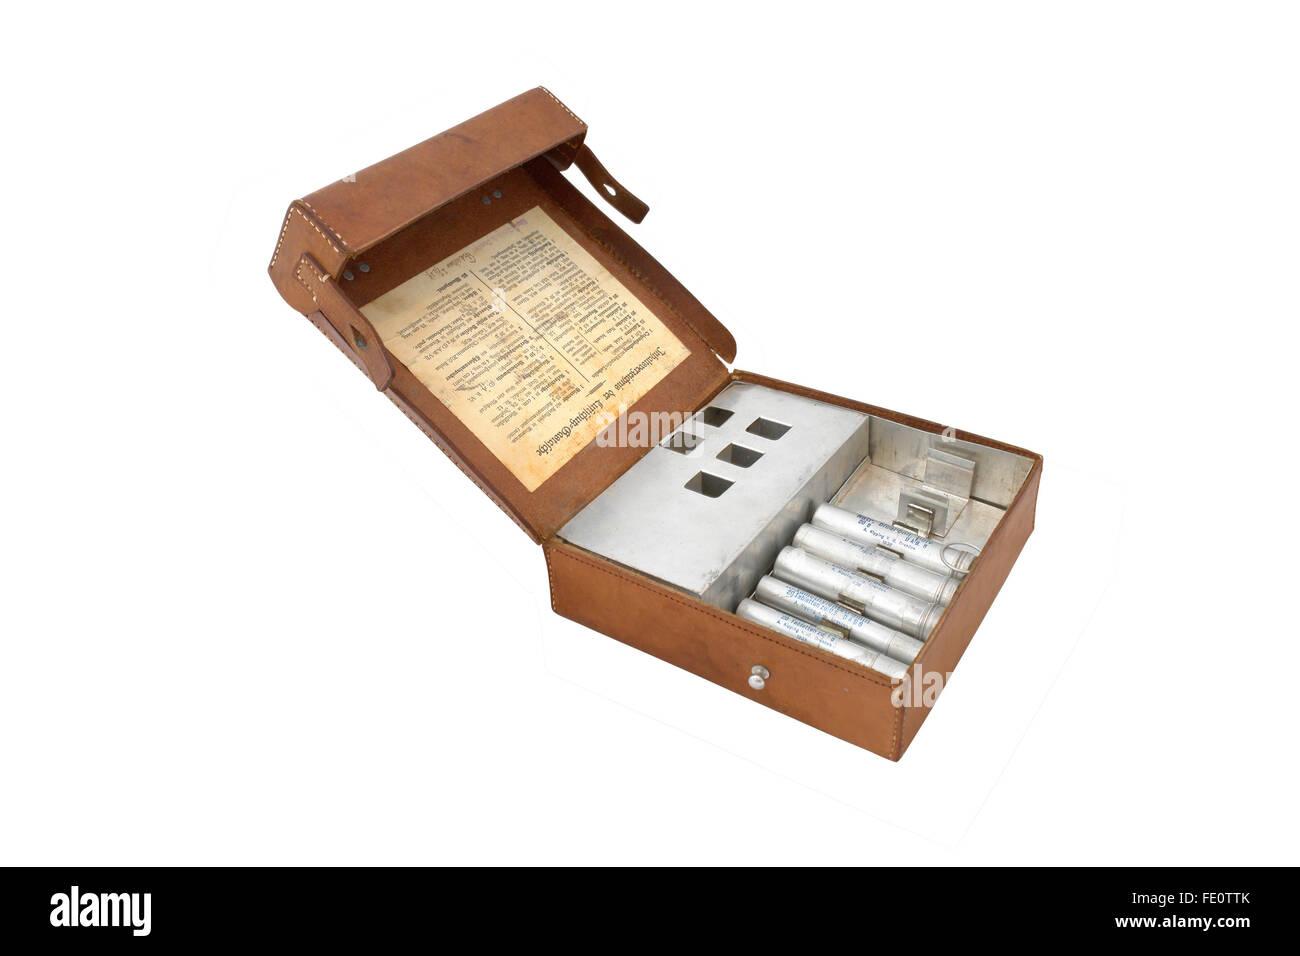 German standard military first aid kit. WW2 - Stock Image